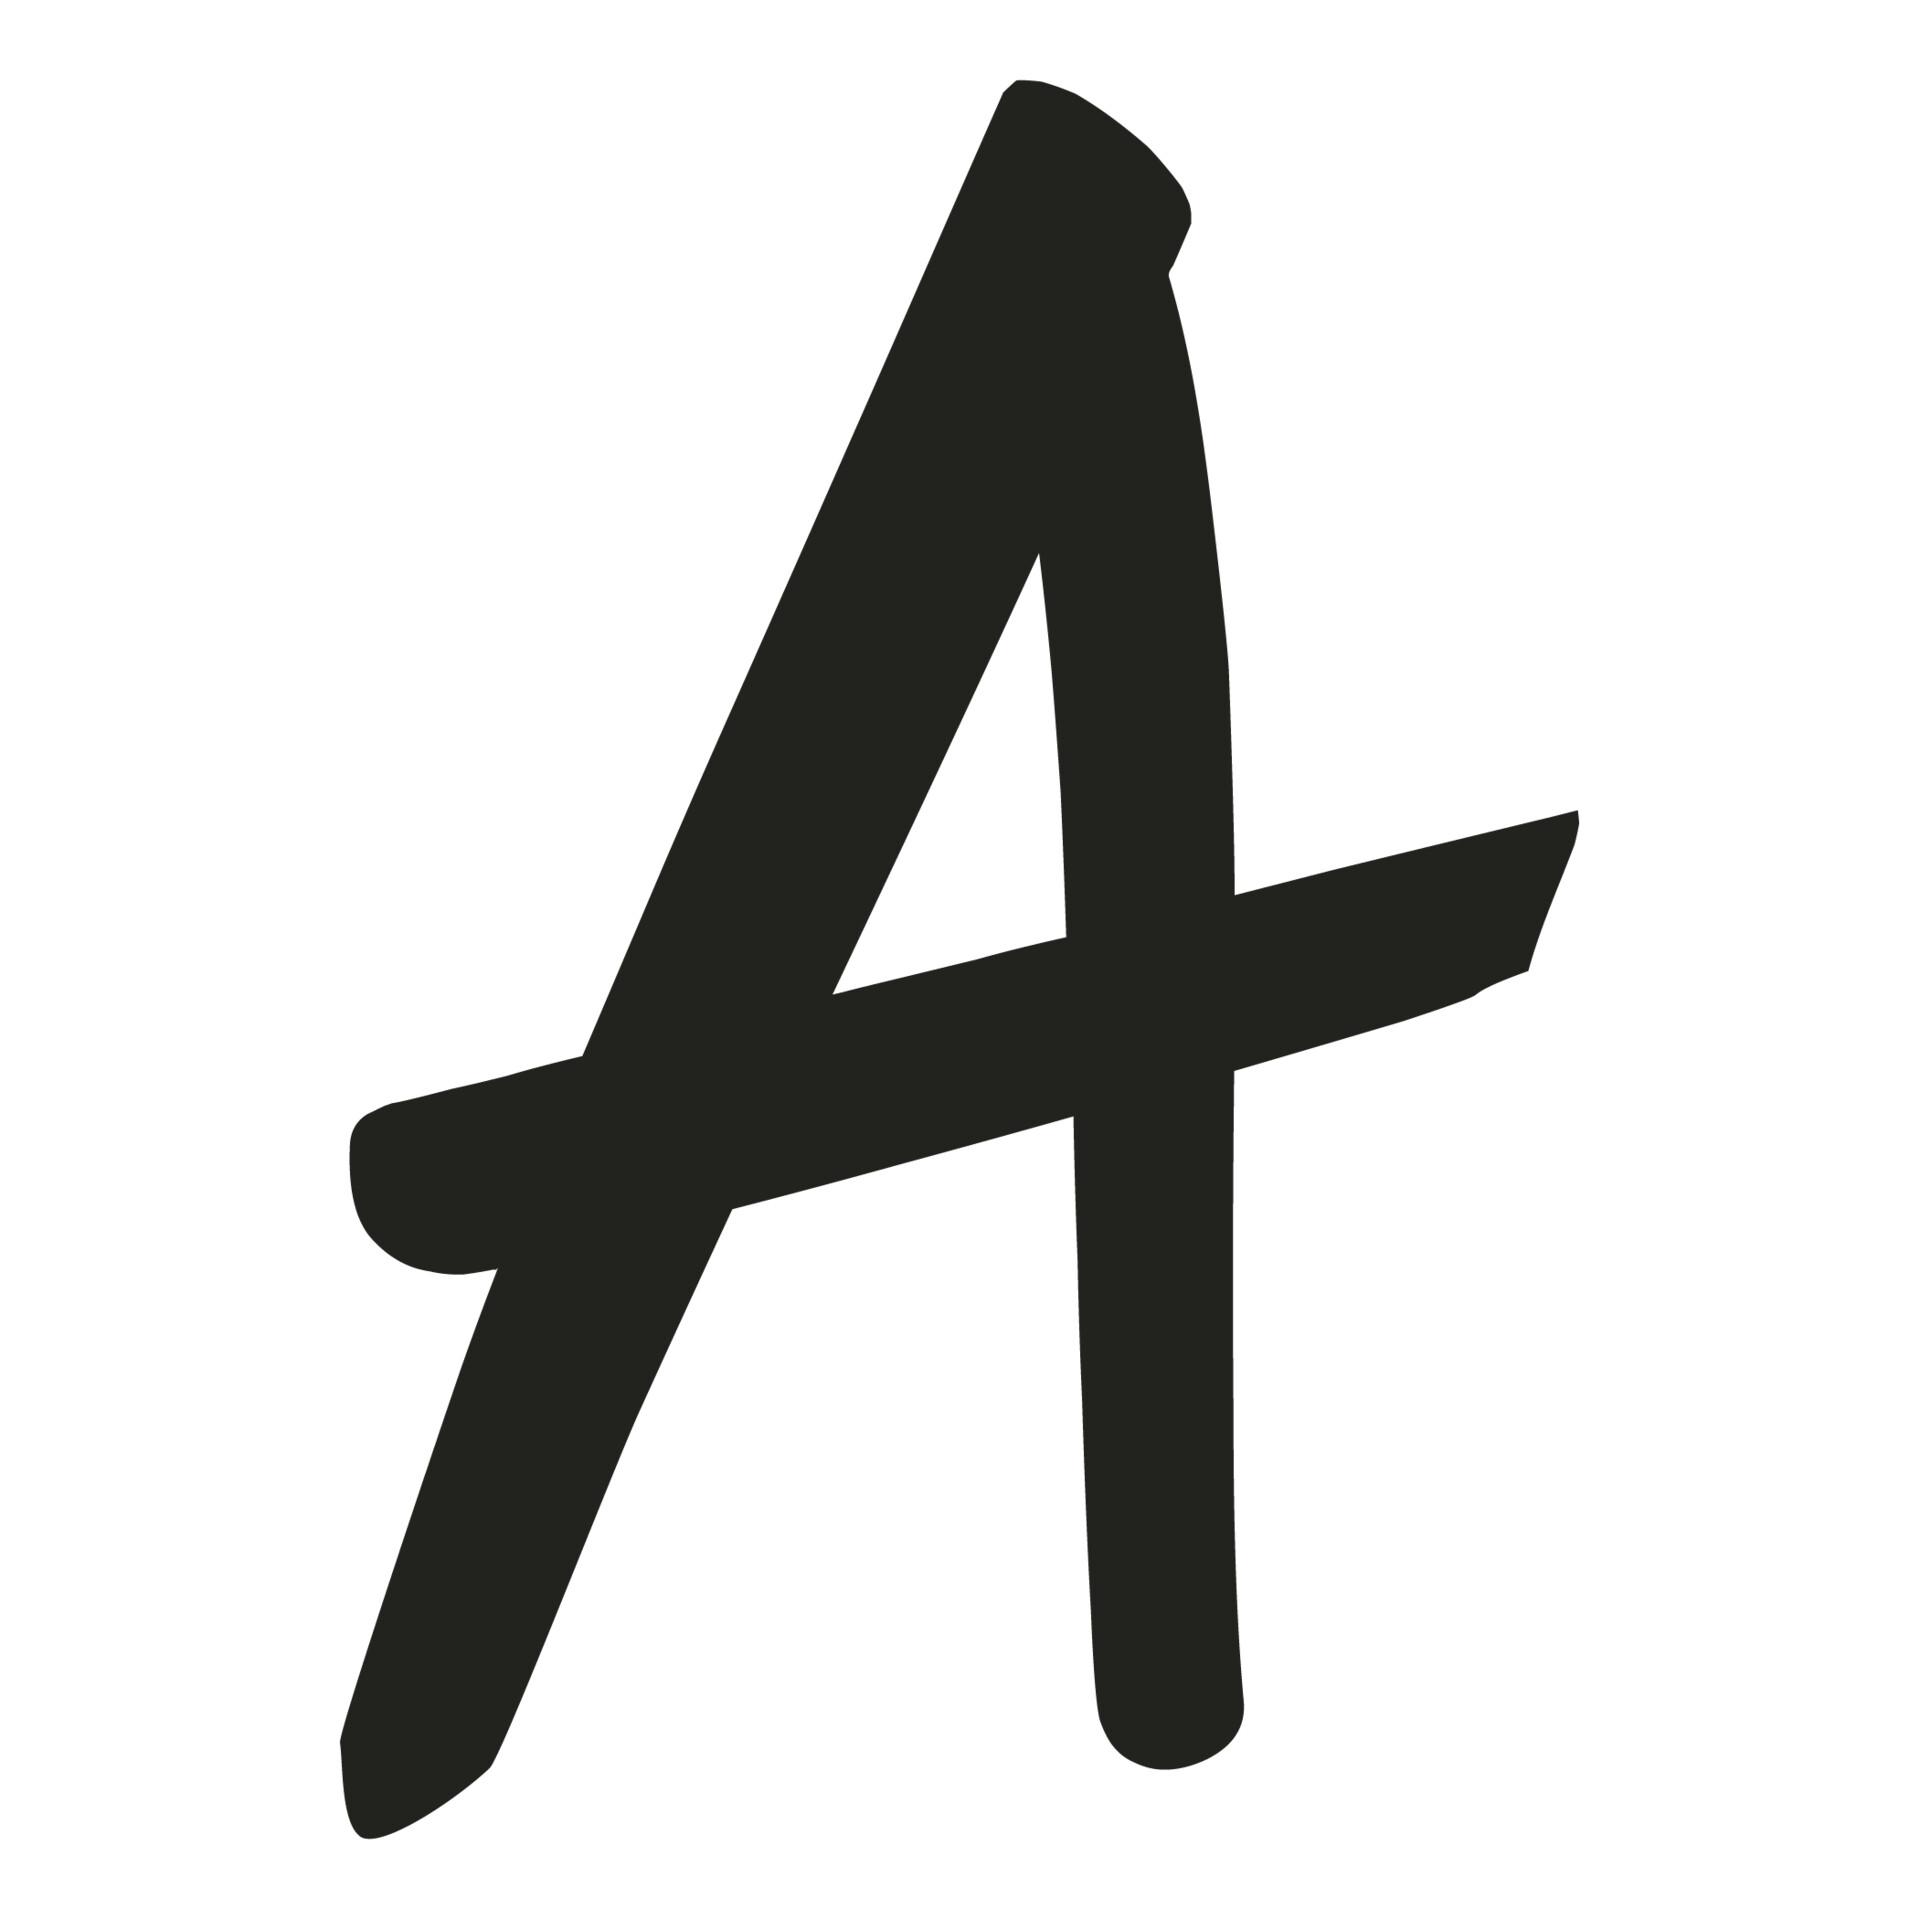 Alecs ganoria alfa by anuna 10